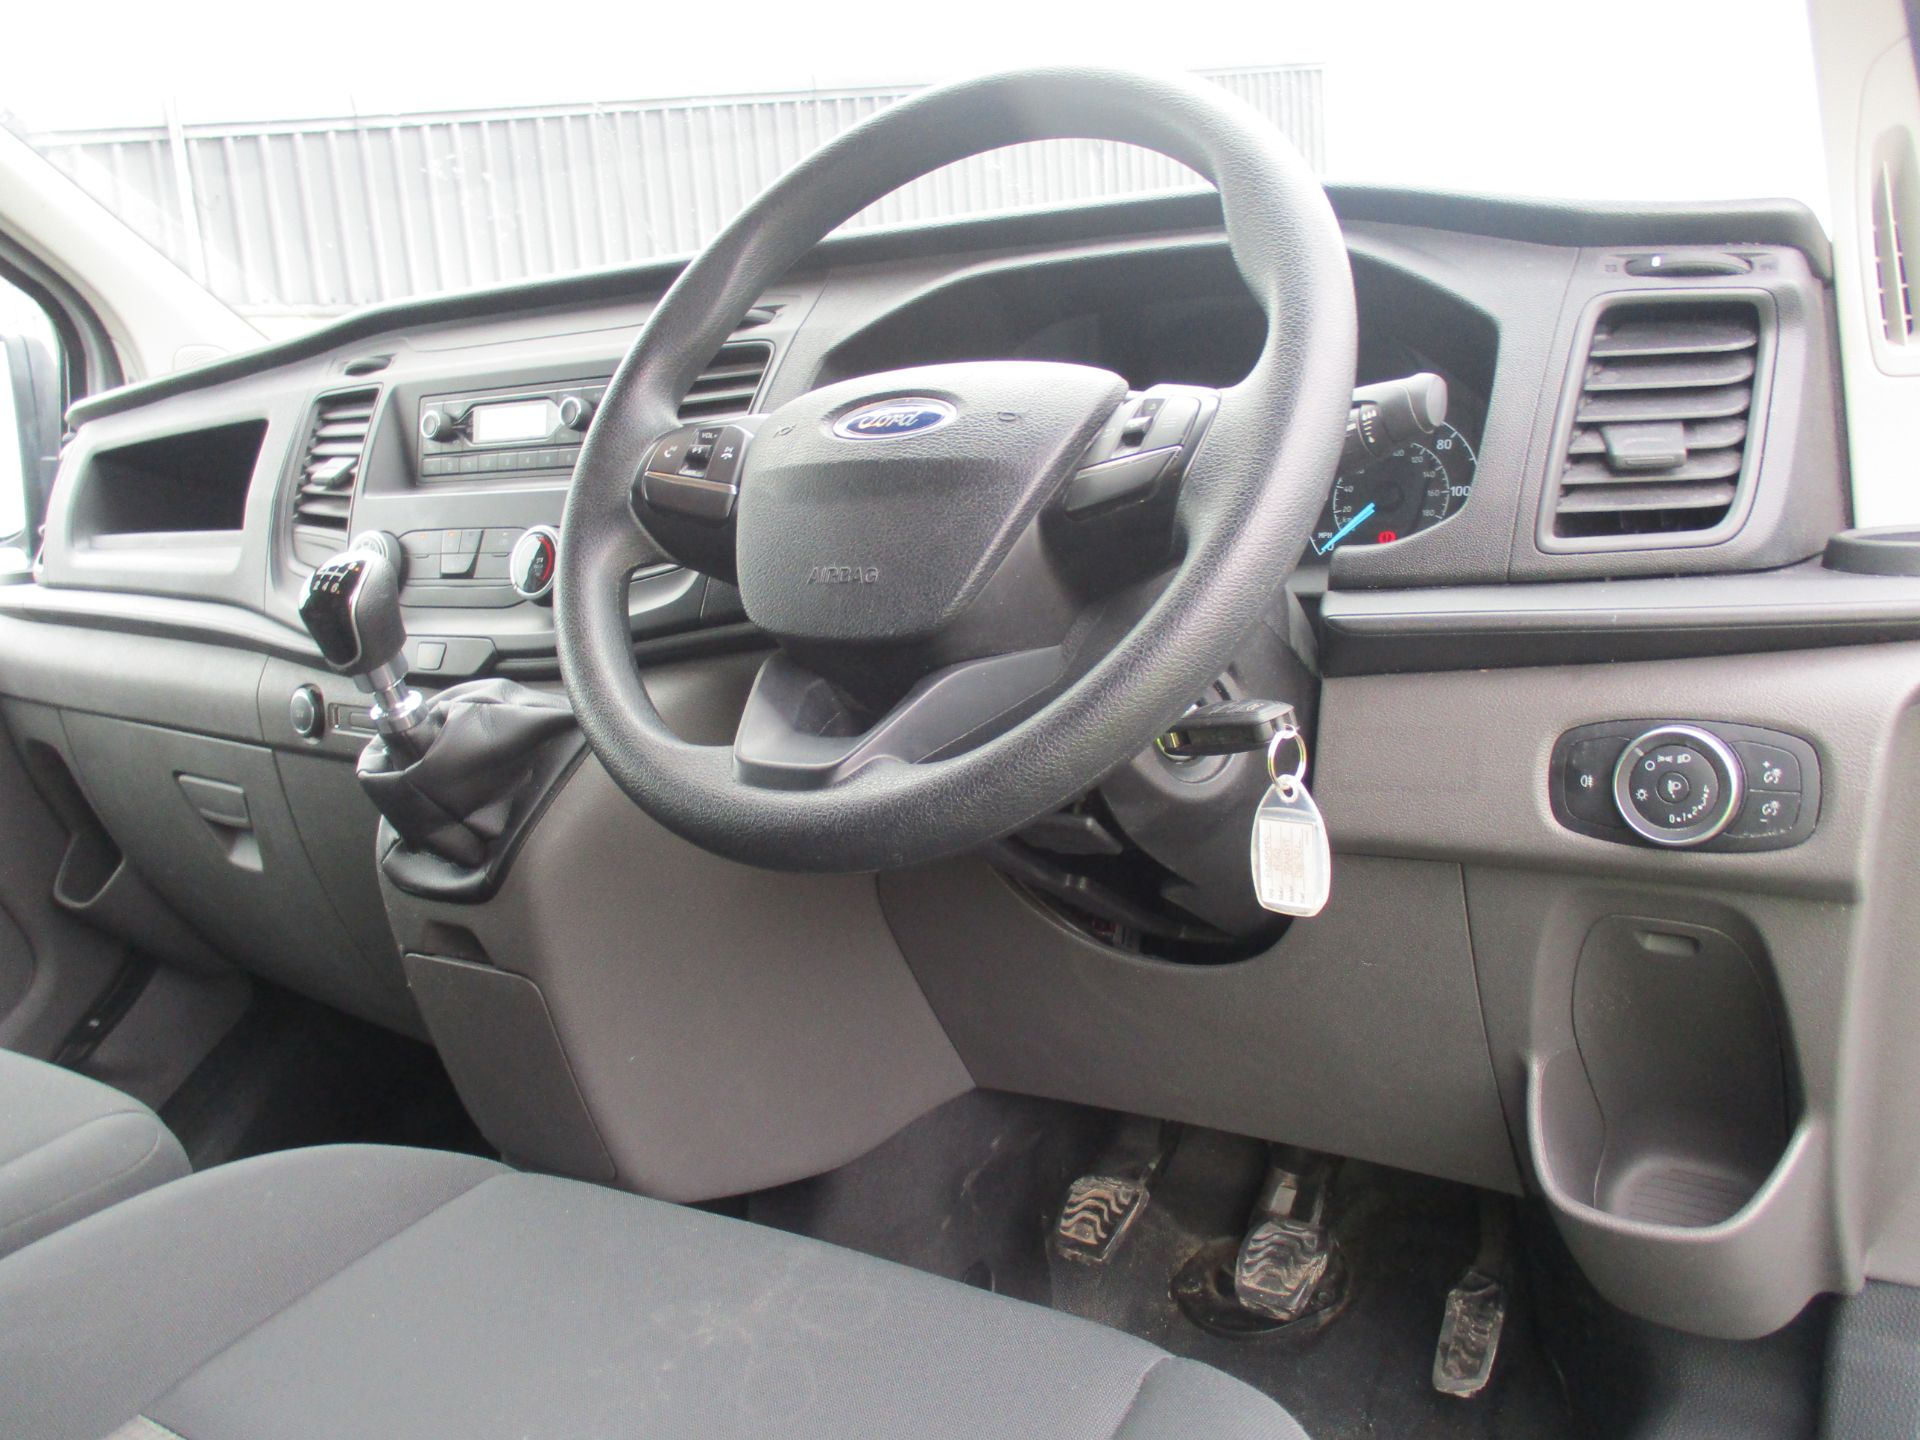 2018 Ford Transit Custom 300 L1 DIESEL FWD 2.0 TDCI 105PS LOW ROOF VAN EURO 6 (FL68AHC) Image 13